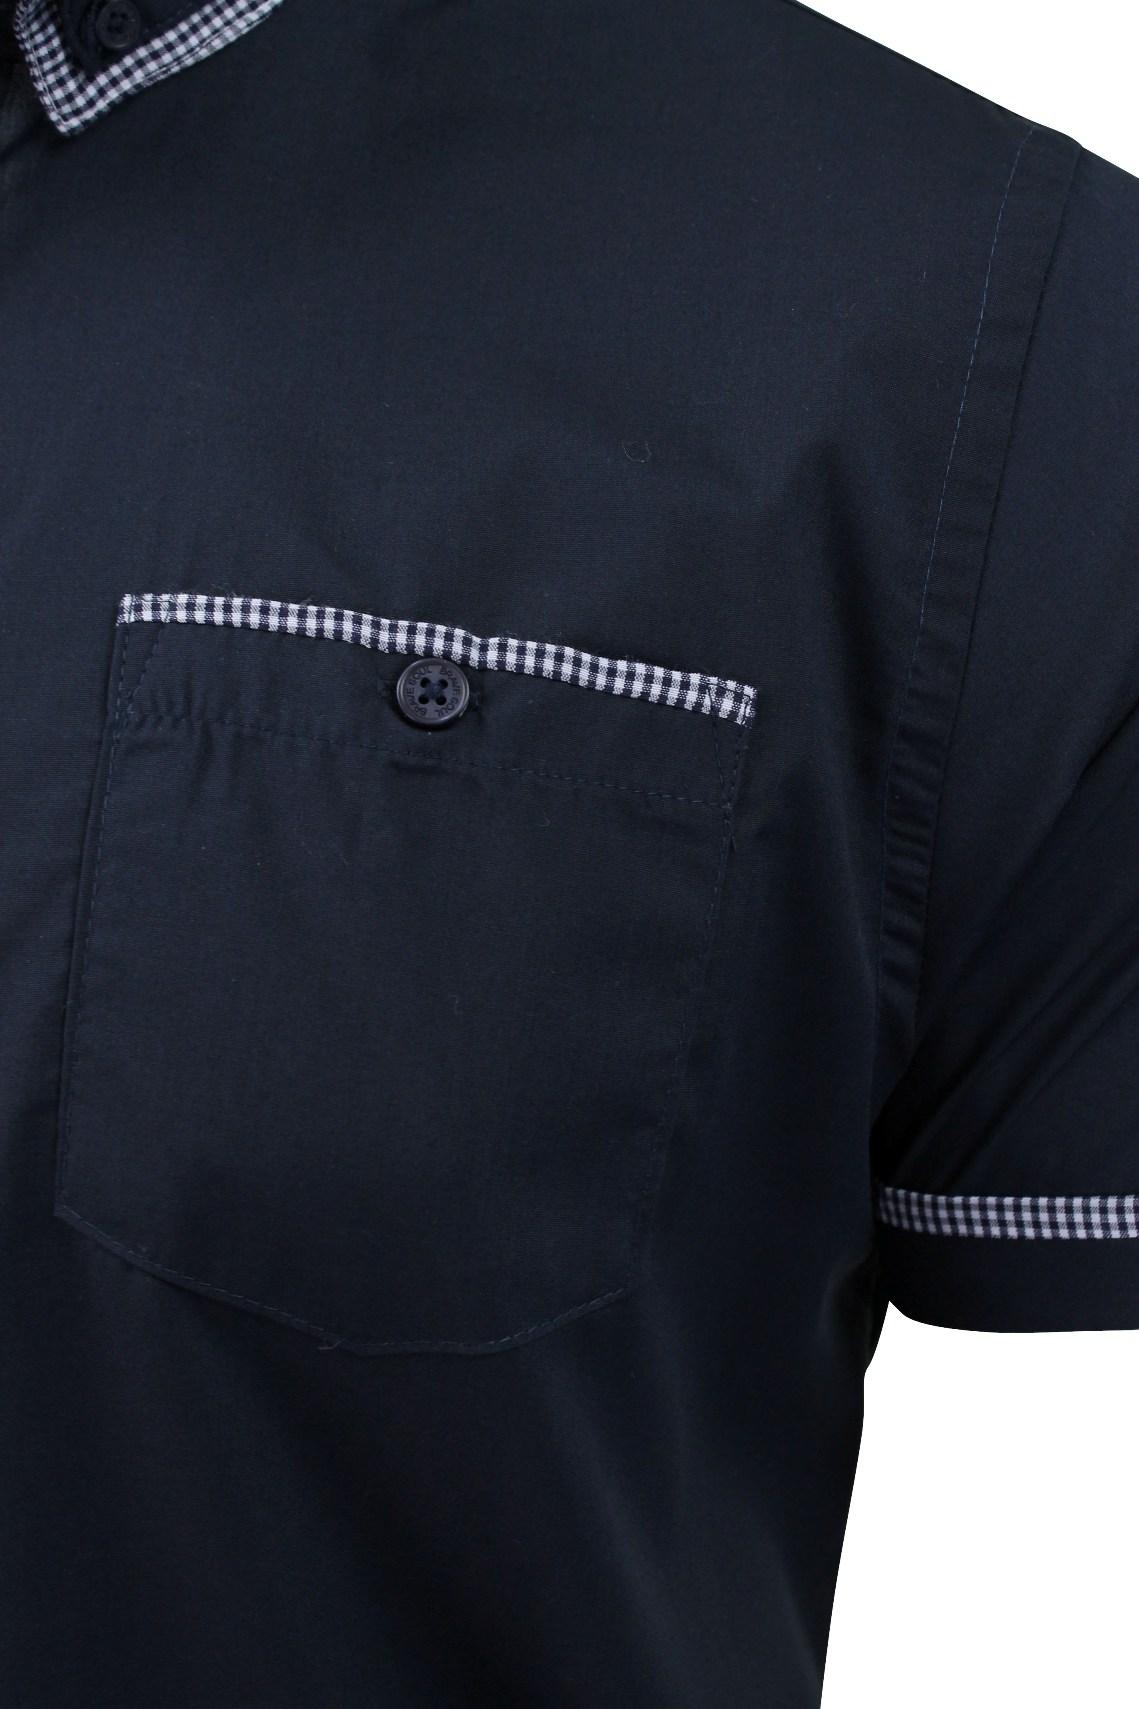 Mens-Shirt-by-Brave-Soul-039-Colvin-039-Gingham-Trim-Short-Sleeved thumbnail 6